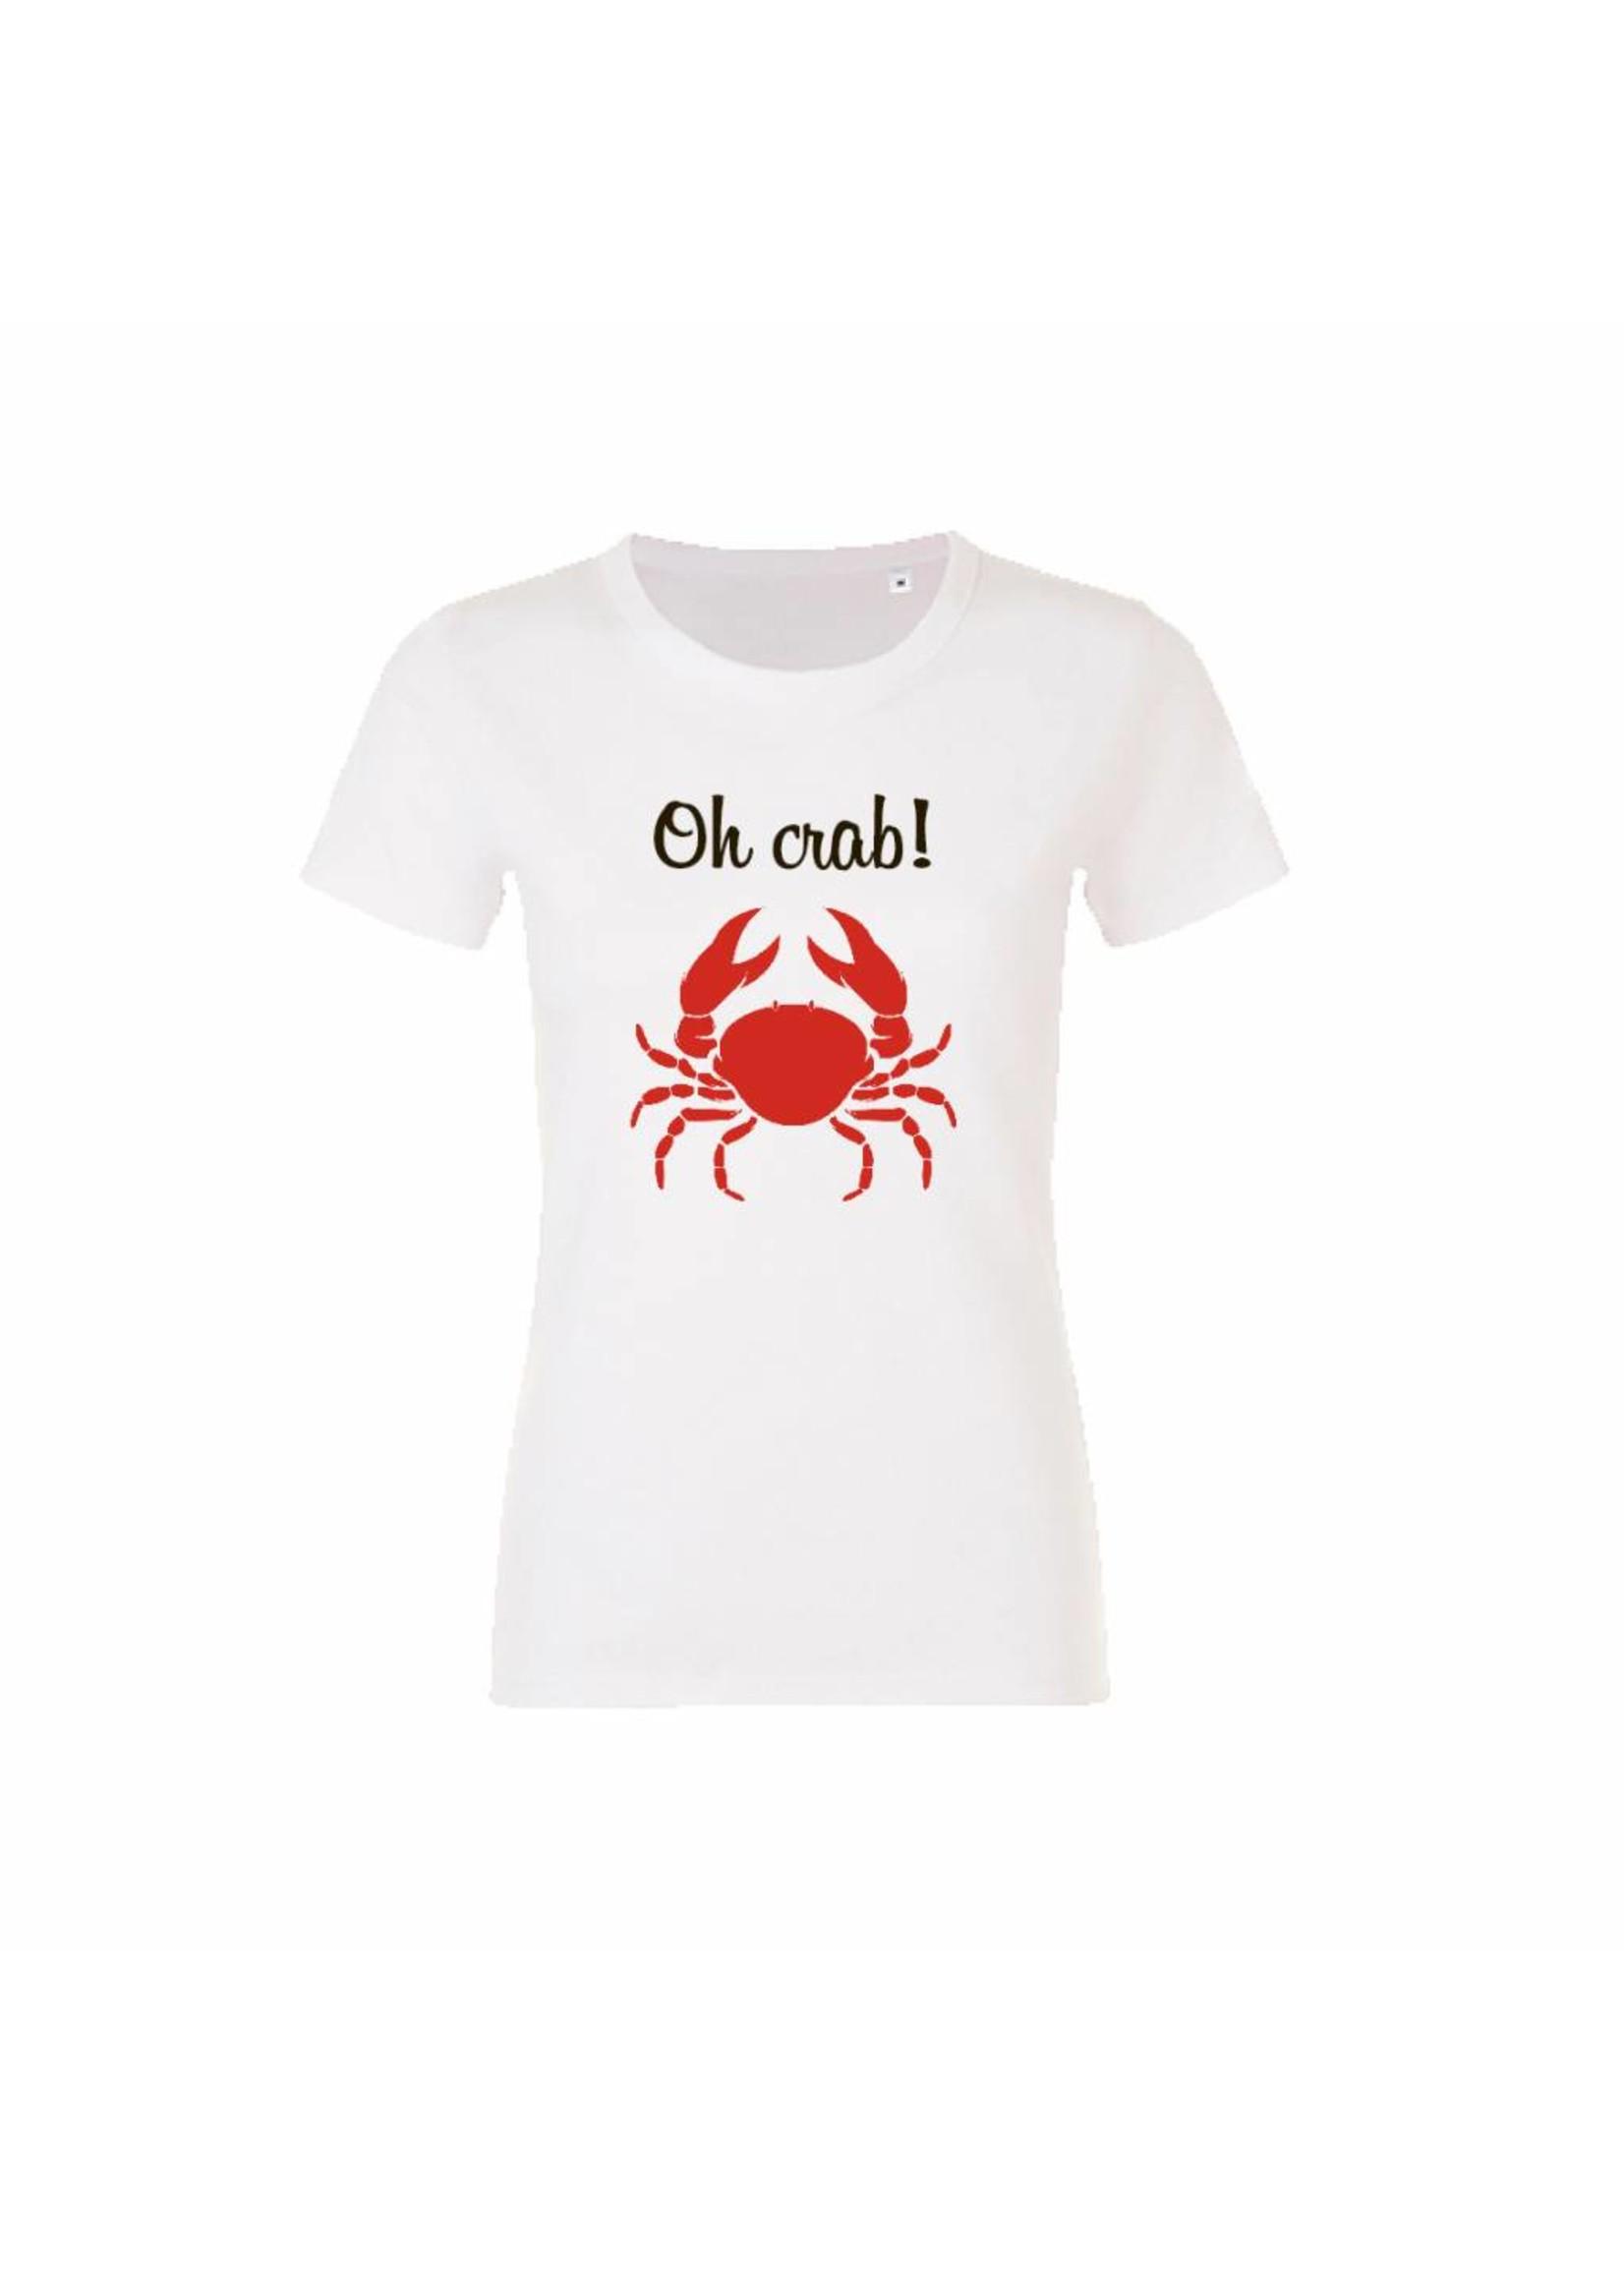 Oh crab t-shirt